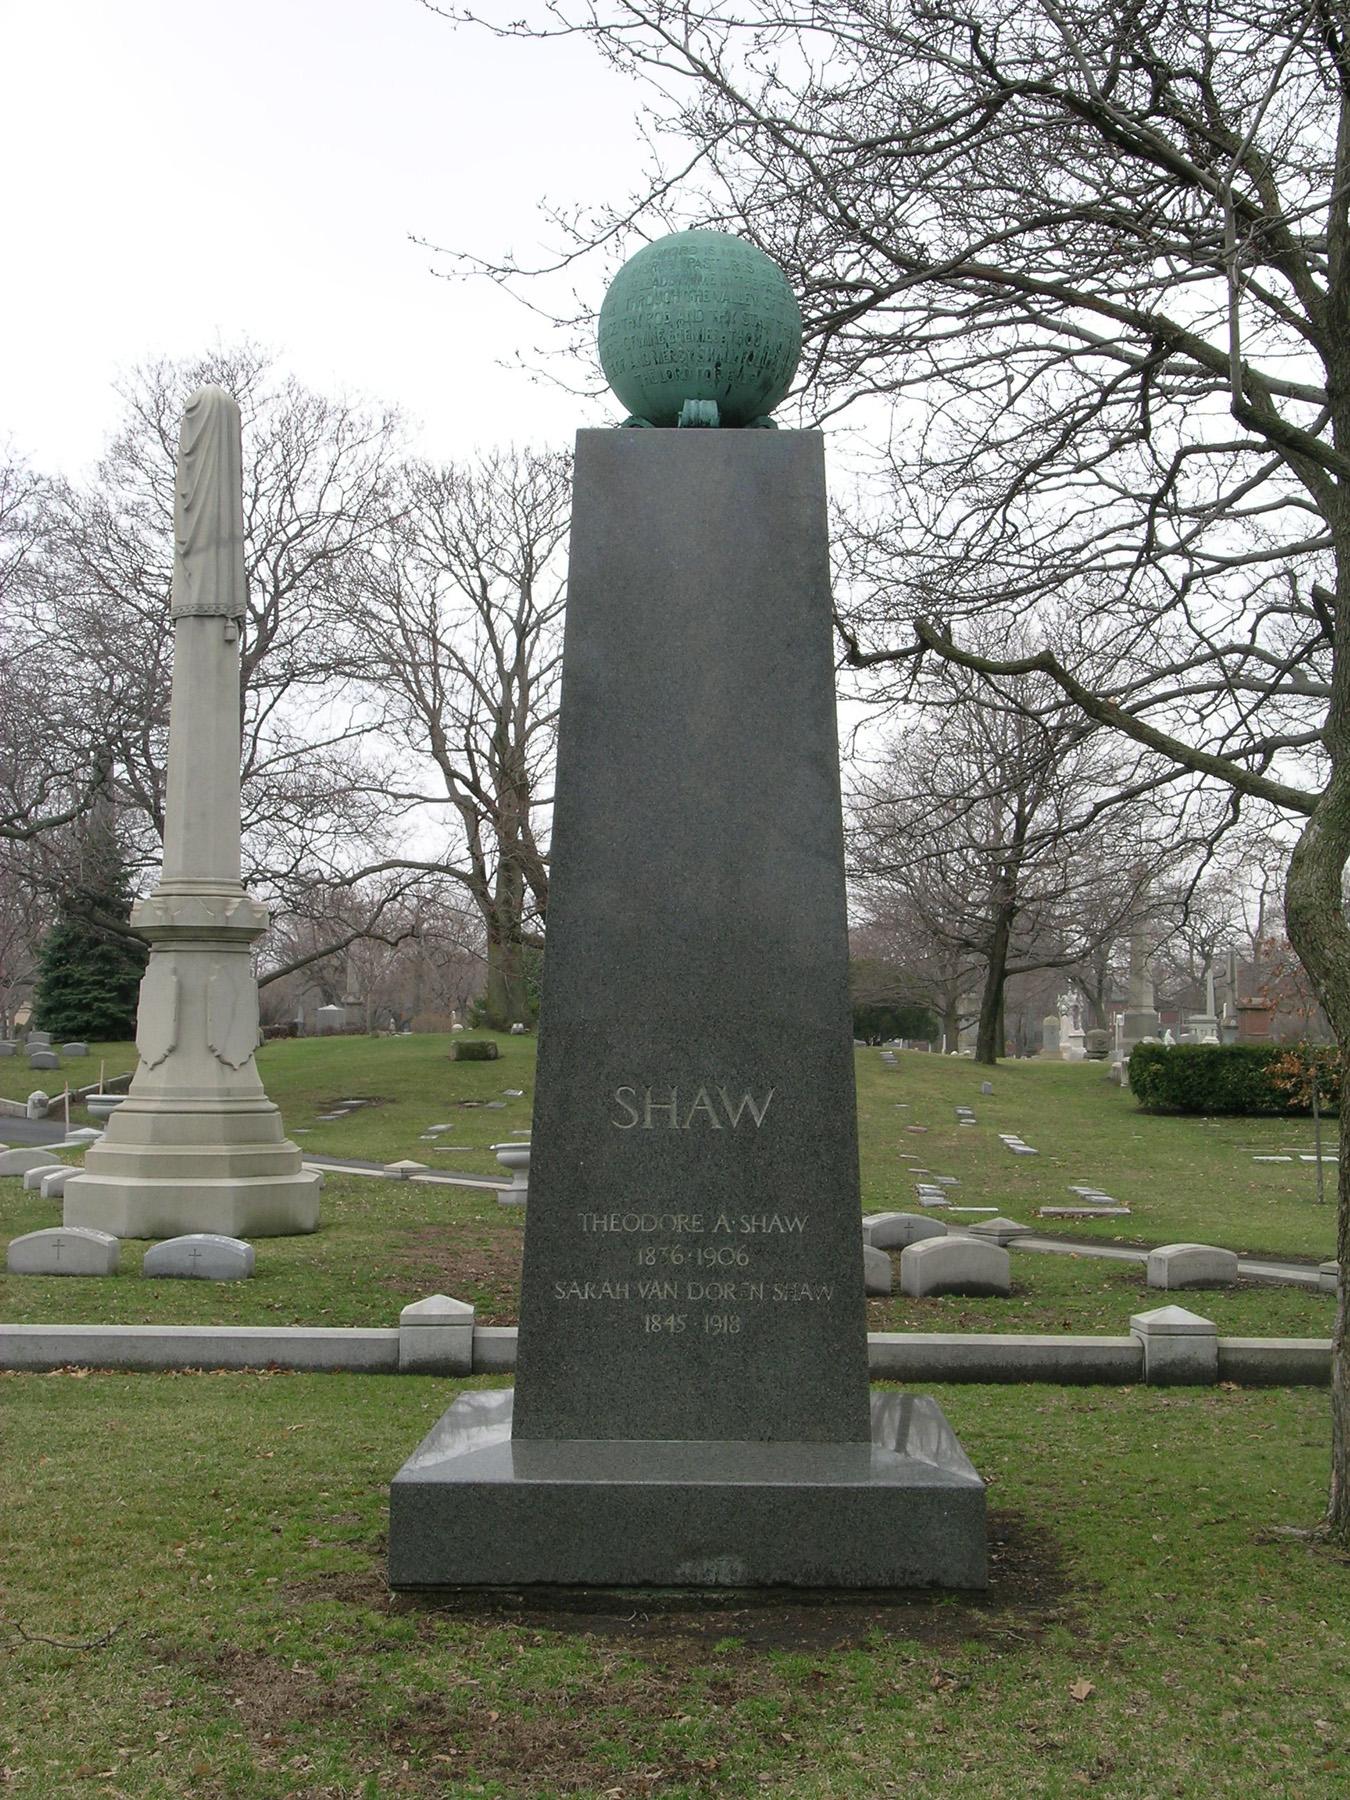 Shaw monument 2007.JPG